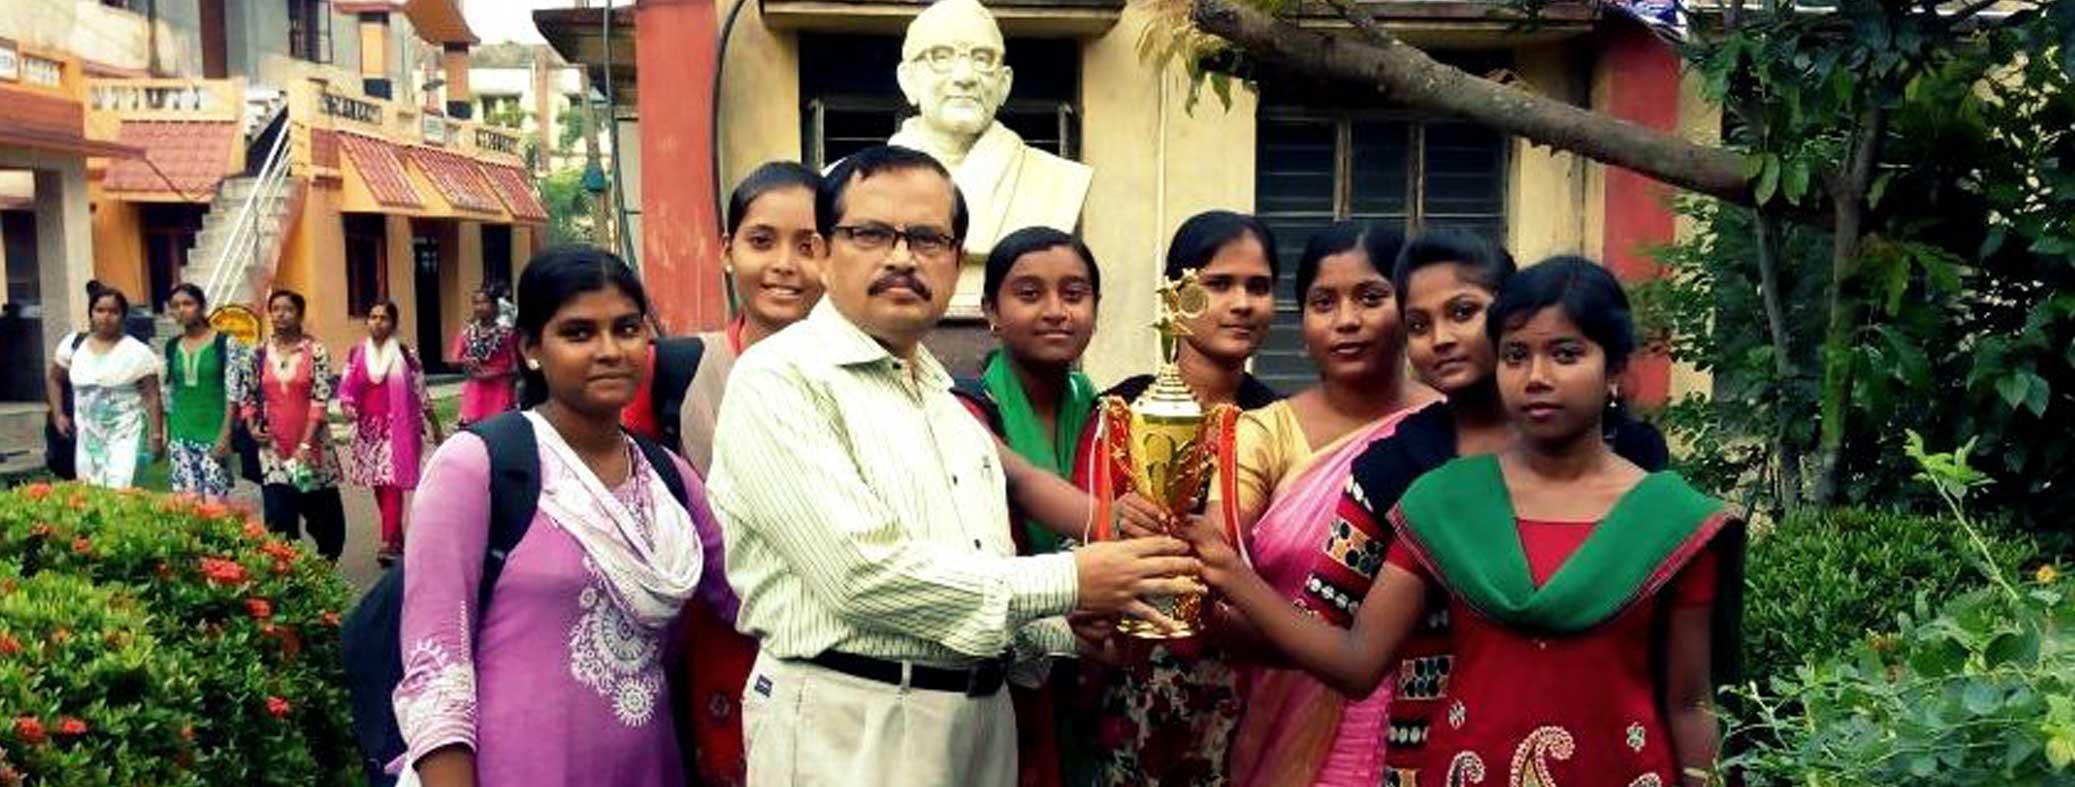 Mahishadal Girls' College, Purba Medinipur Image